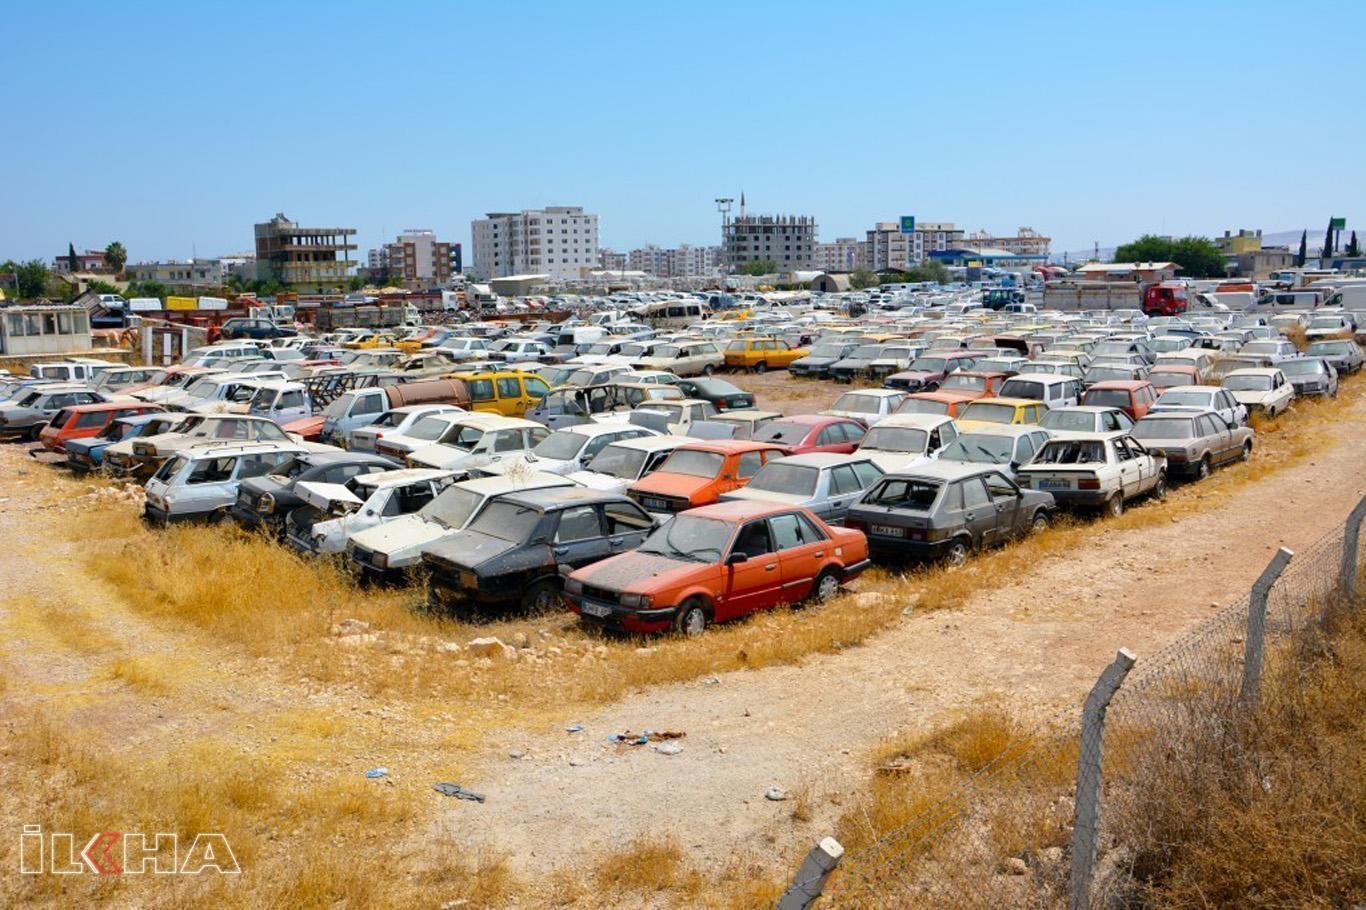 Hurda Araç Teşviki 15 Bin Liraya Yükseltildi